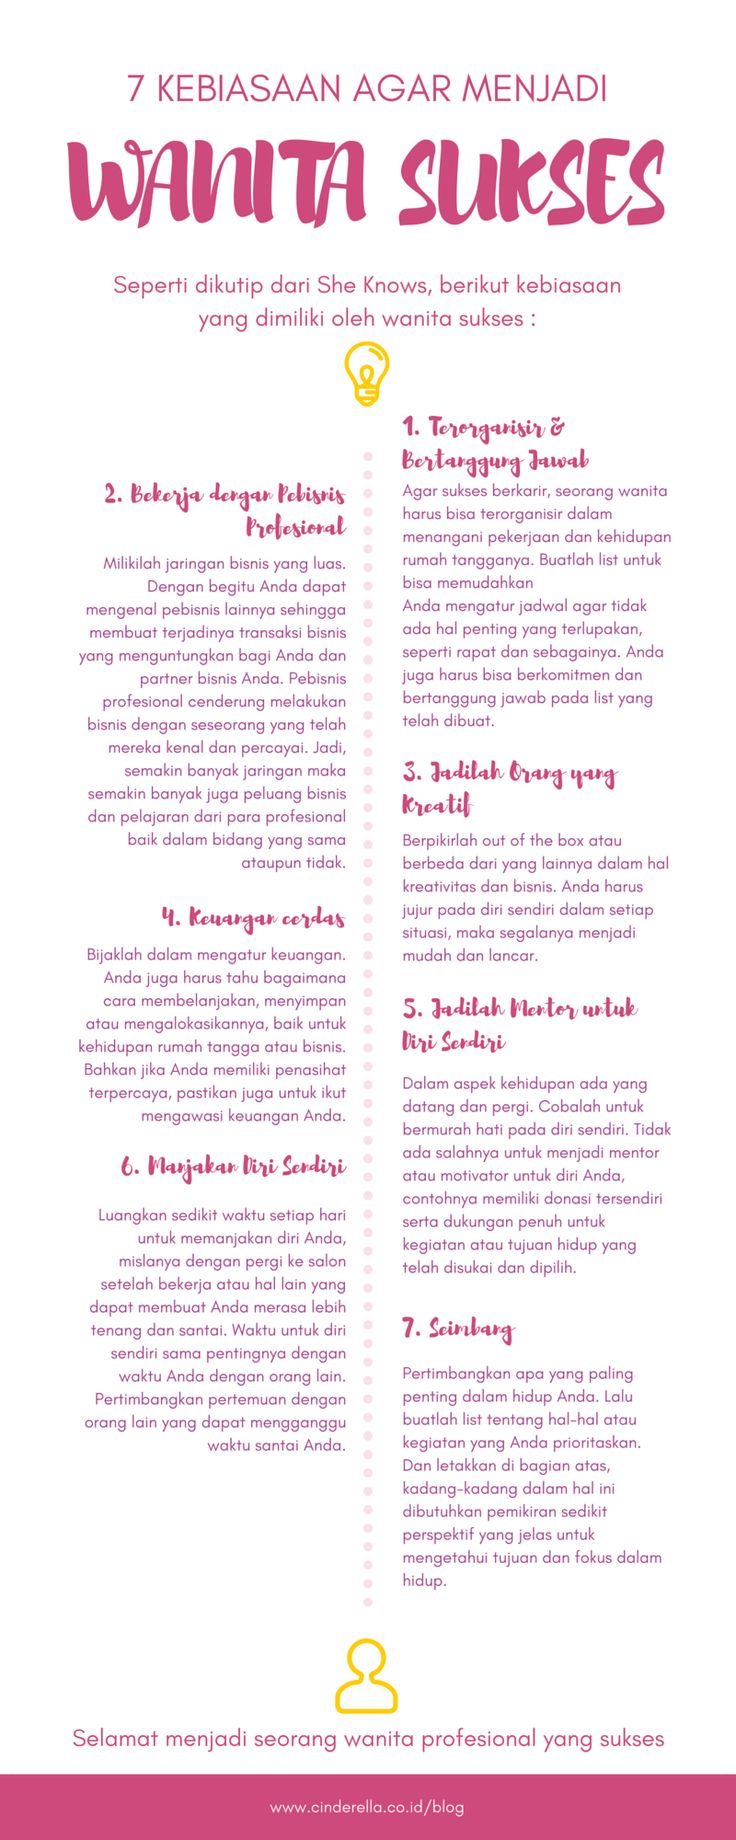 7 Kebiasaan Agar Menjadi Wanita Sukses